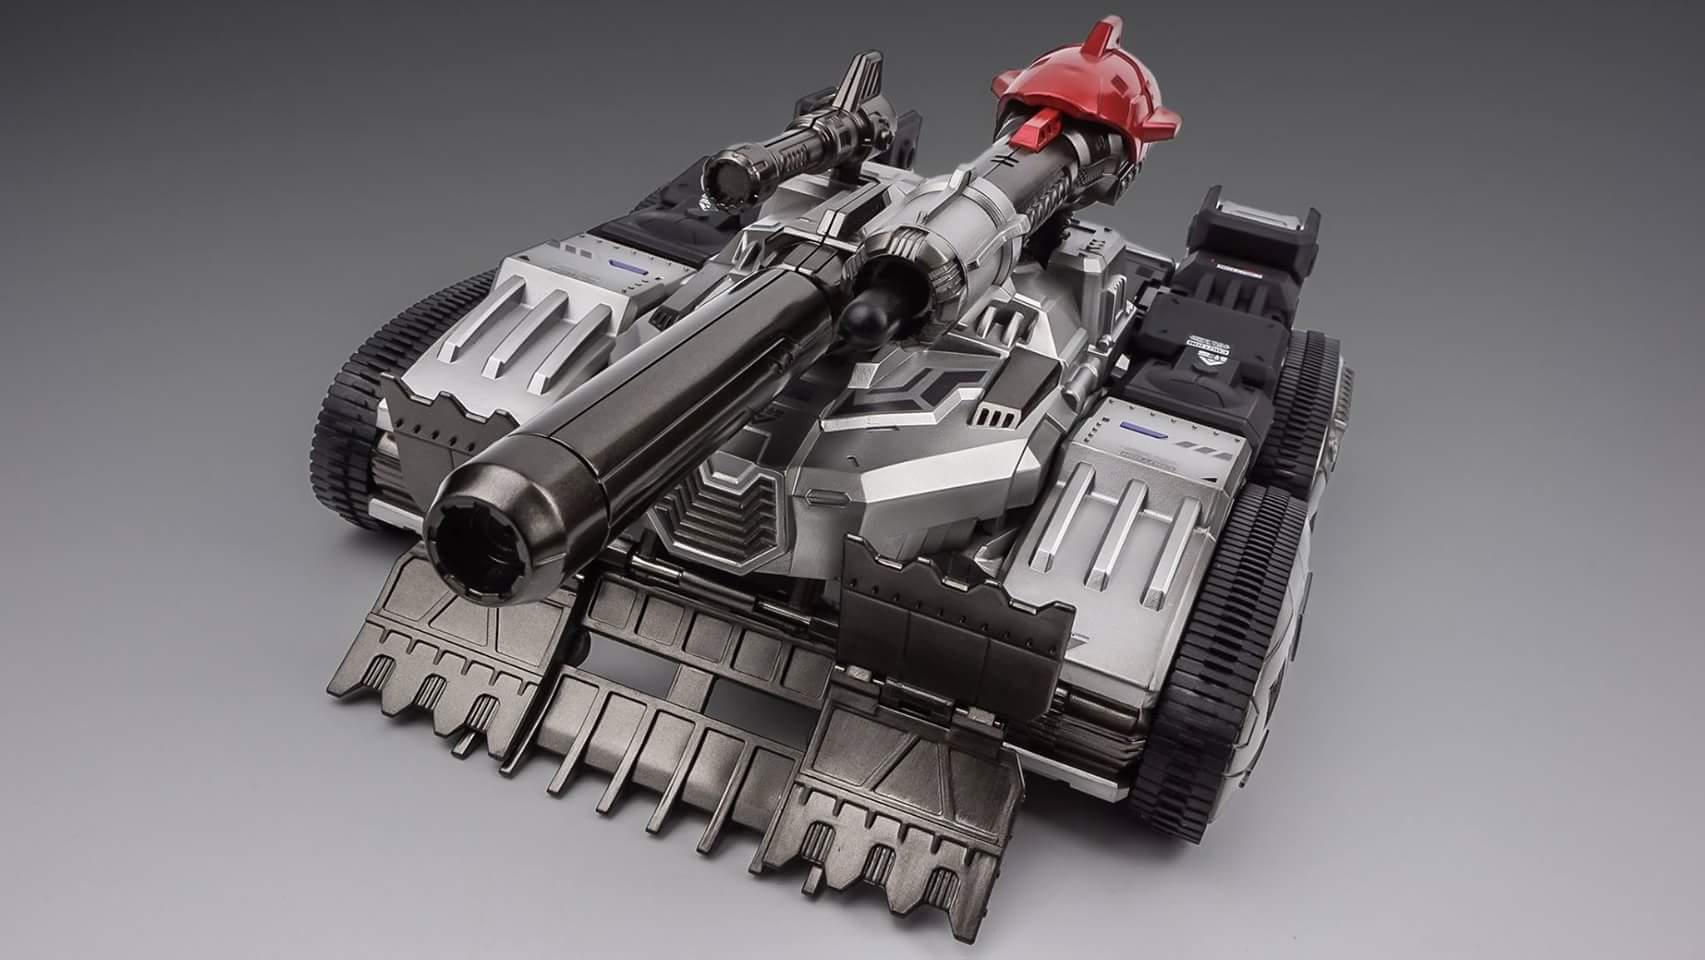 [SparkToys] Produit Tiers - ST - aka War Within: Optimus, Mégatron, Grimlock/La Menace, etc - Page 2 MohqbEcg